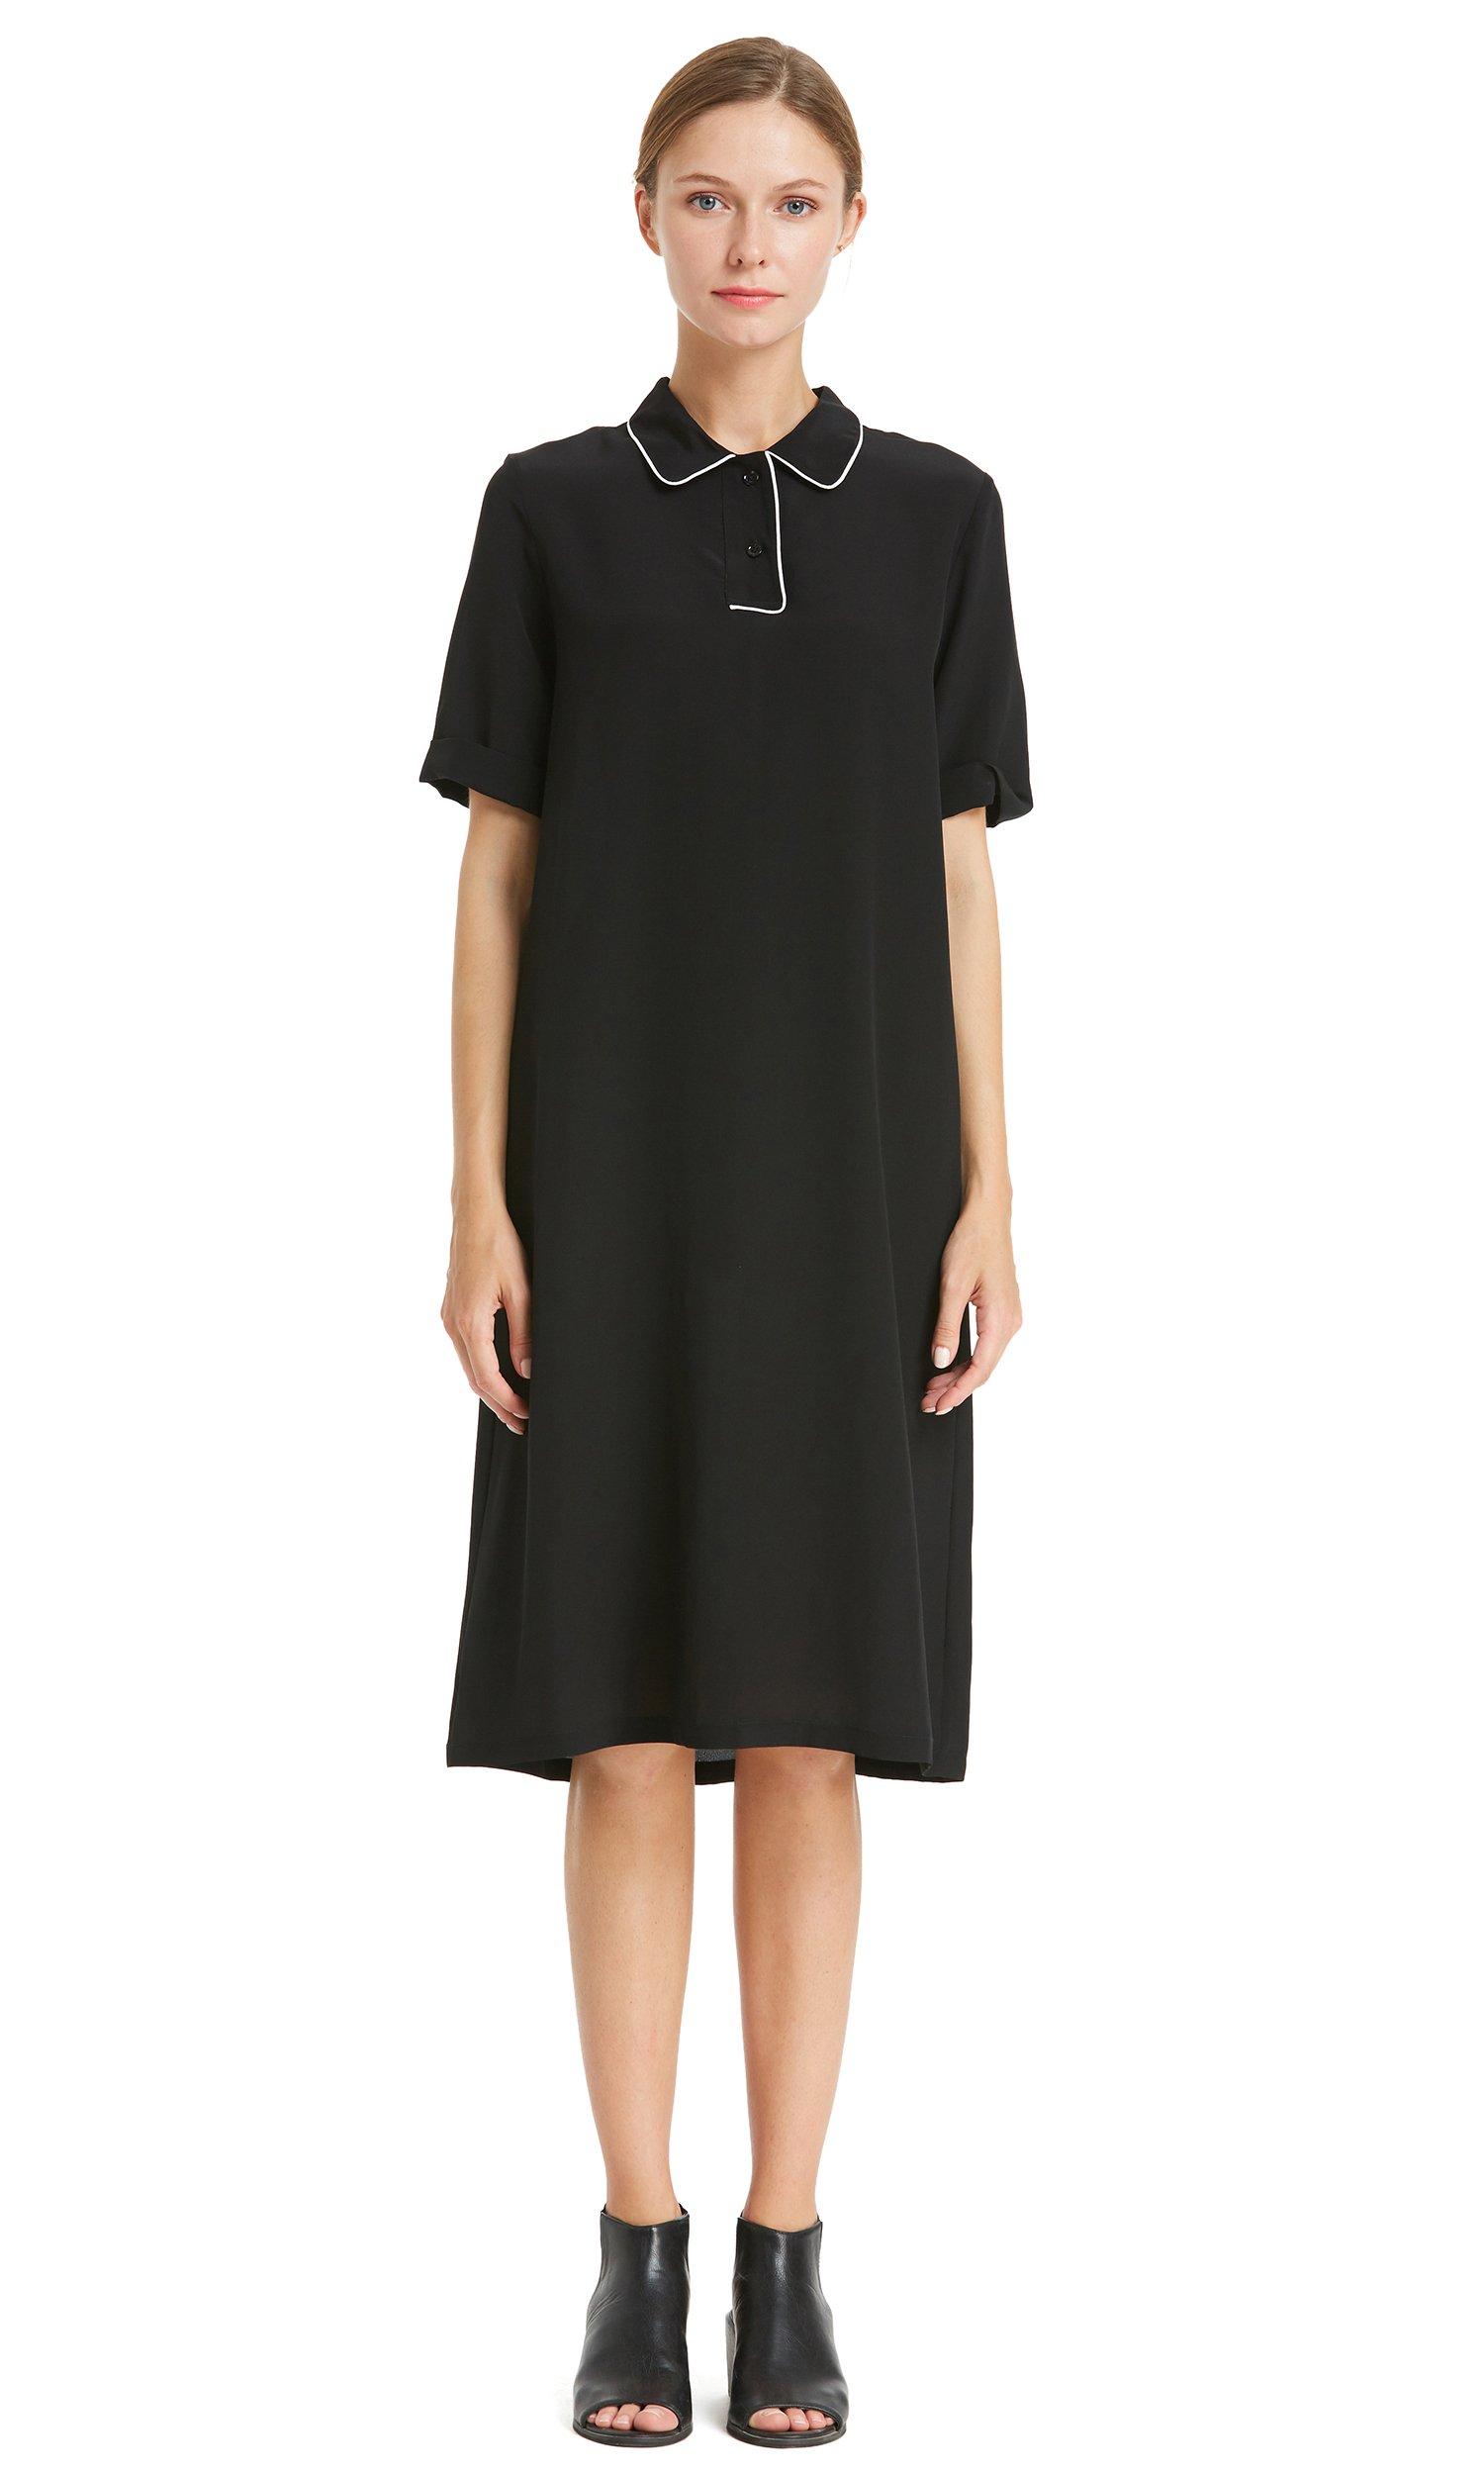 LilySilk Silk Dress For Women 18MM Polo Buttons Shift Short Sleeve Office Work Wear Black L/12